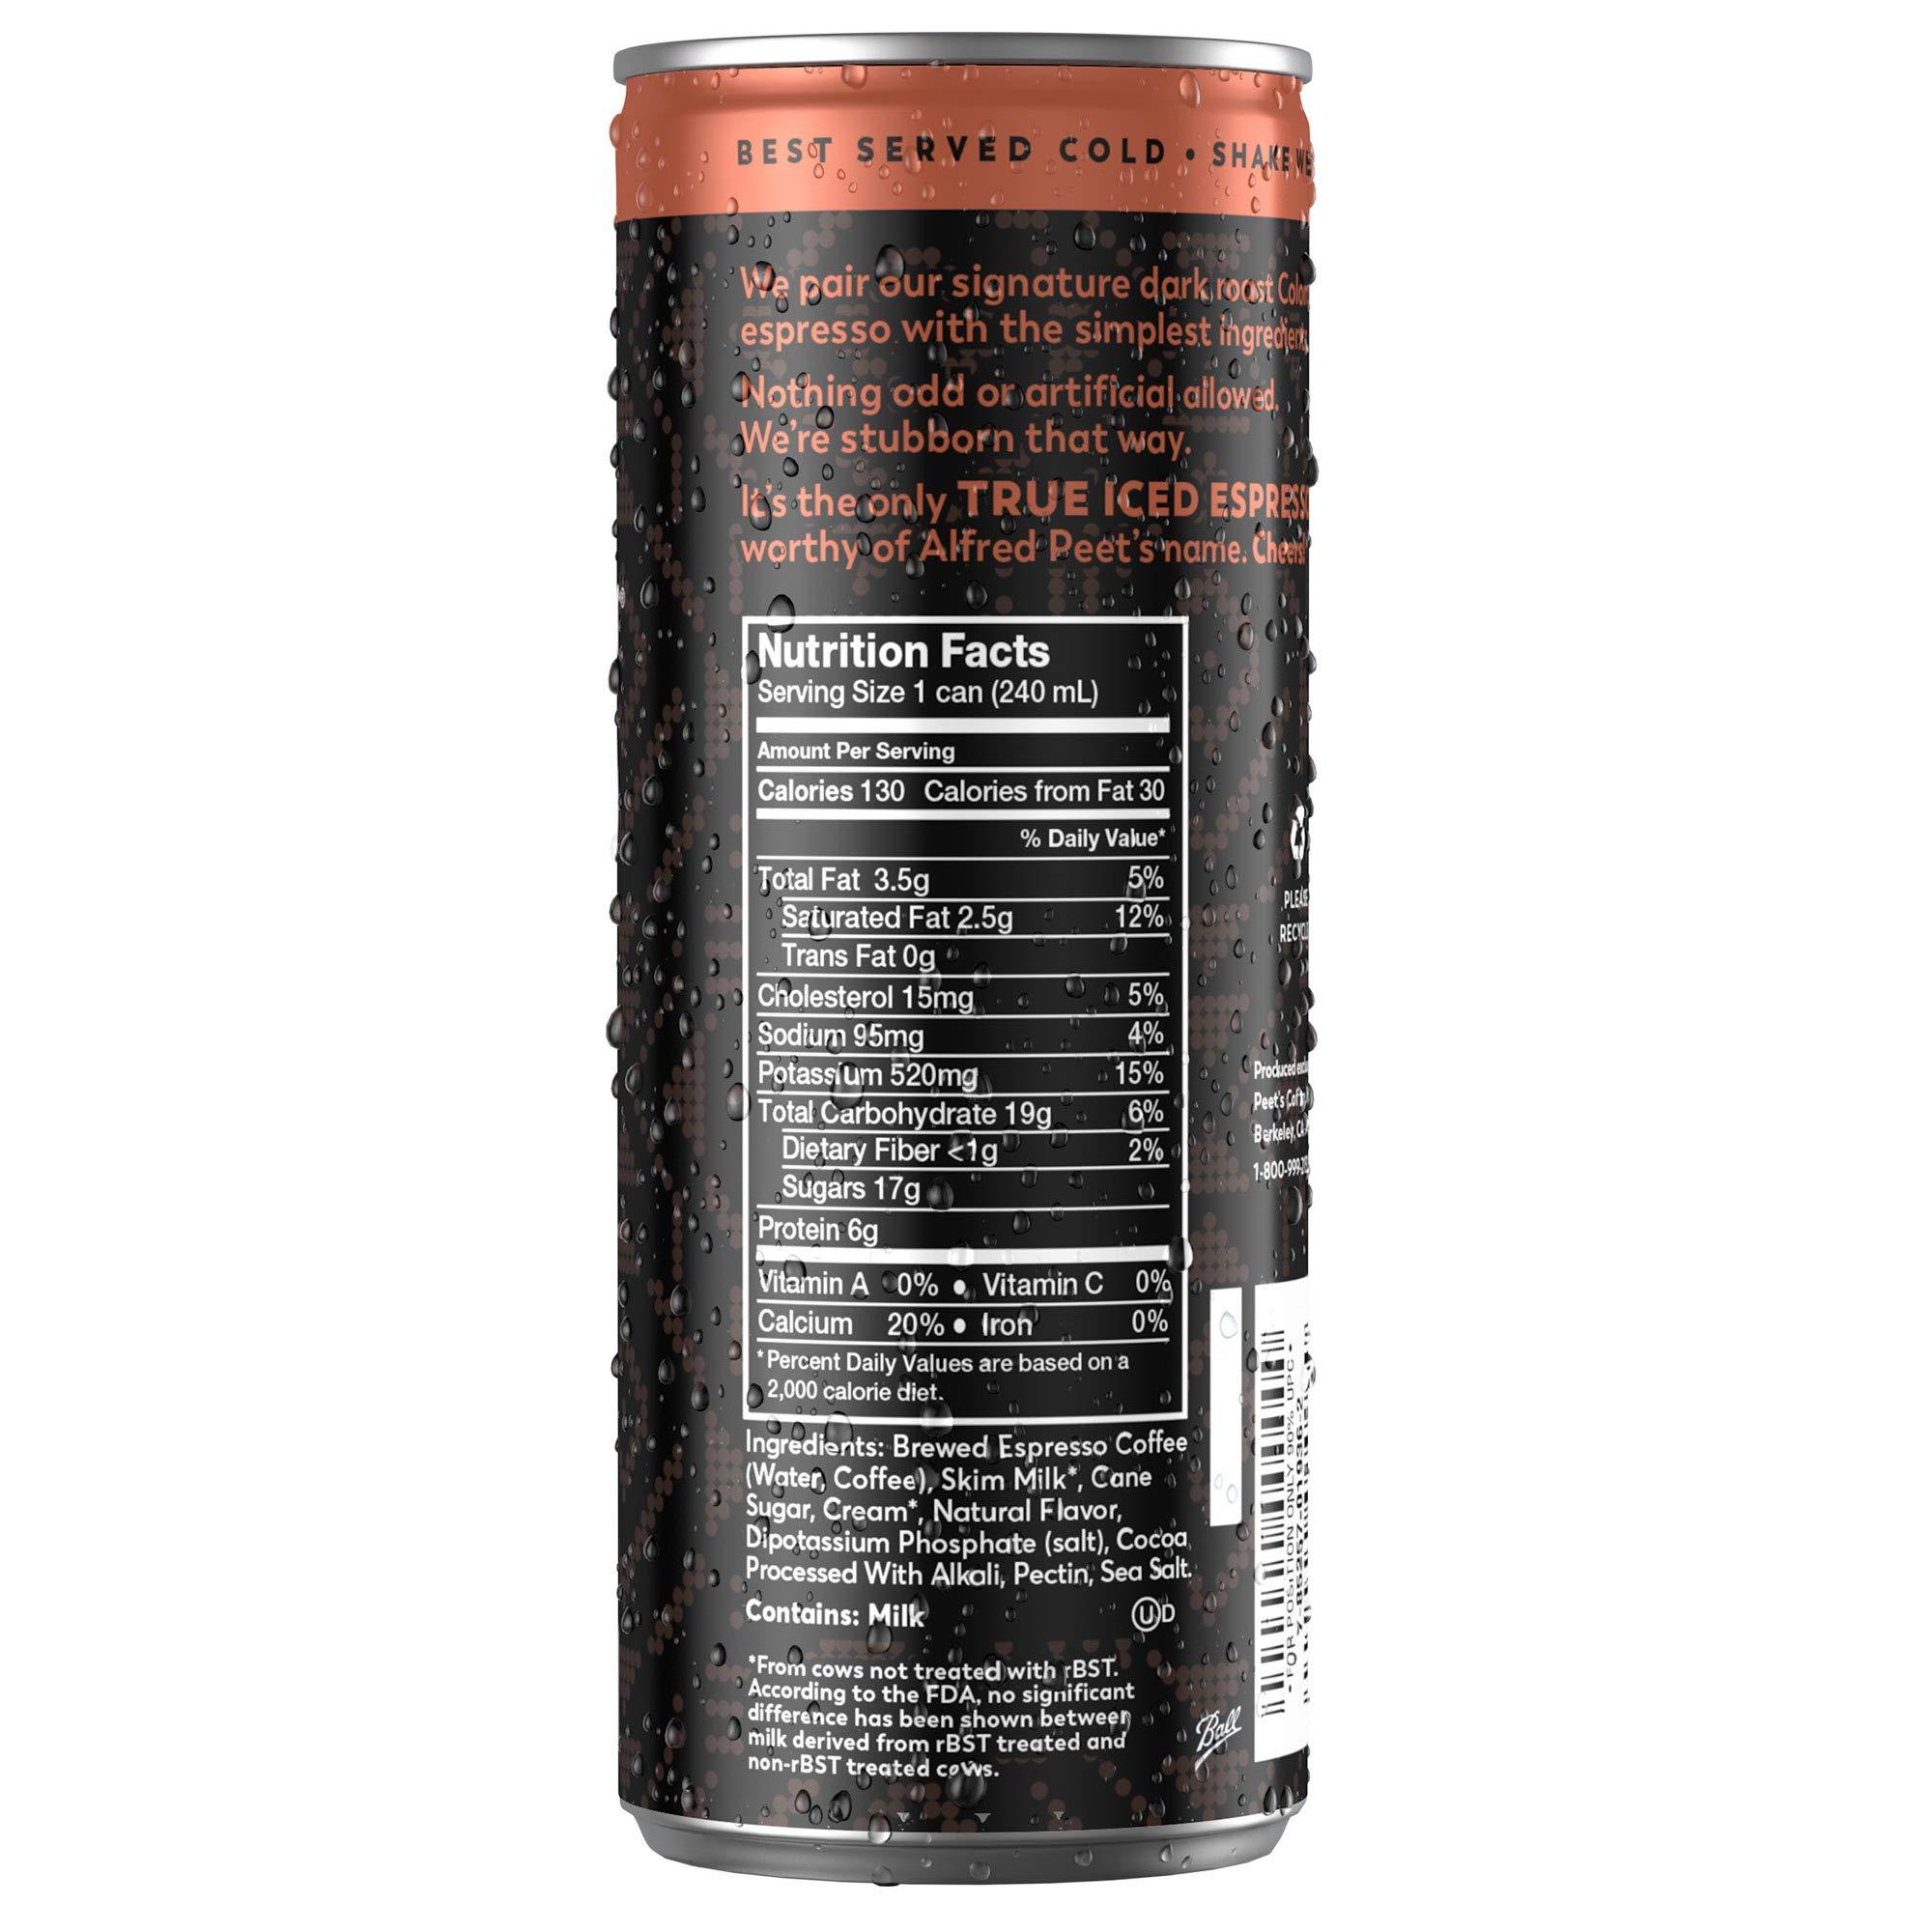 Peet's Iced Espresso Mocha Chocolate 8 oz Can (12 Count) Single-Origin Colombian Espresso with Dutch Process Cocoa & Milk 110 Calorie 17 grams of sugar by Peet's Coffee (Image #2)